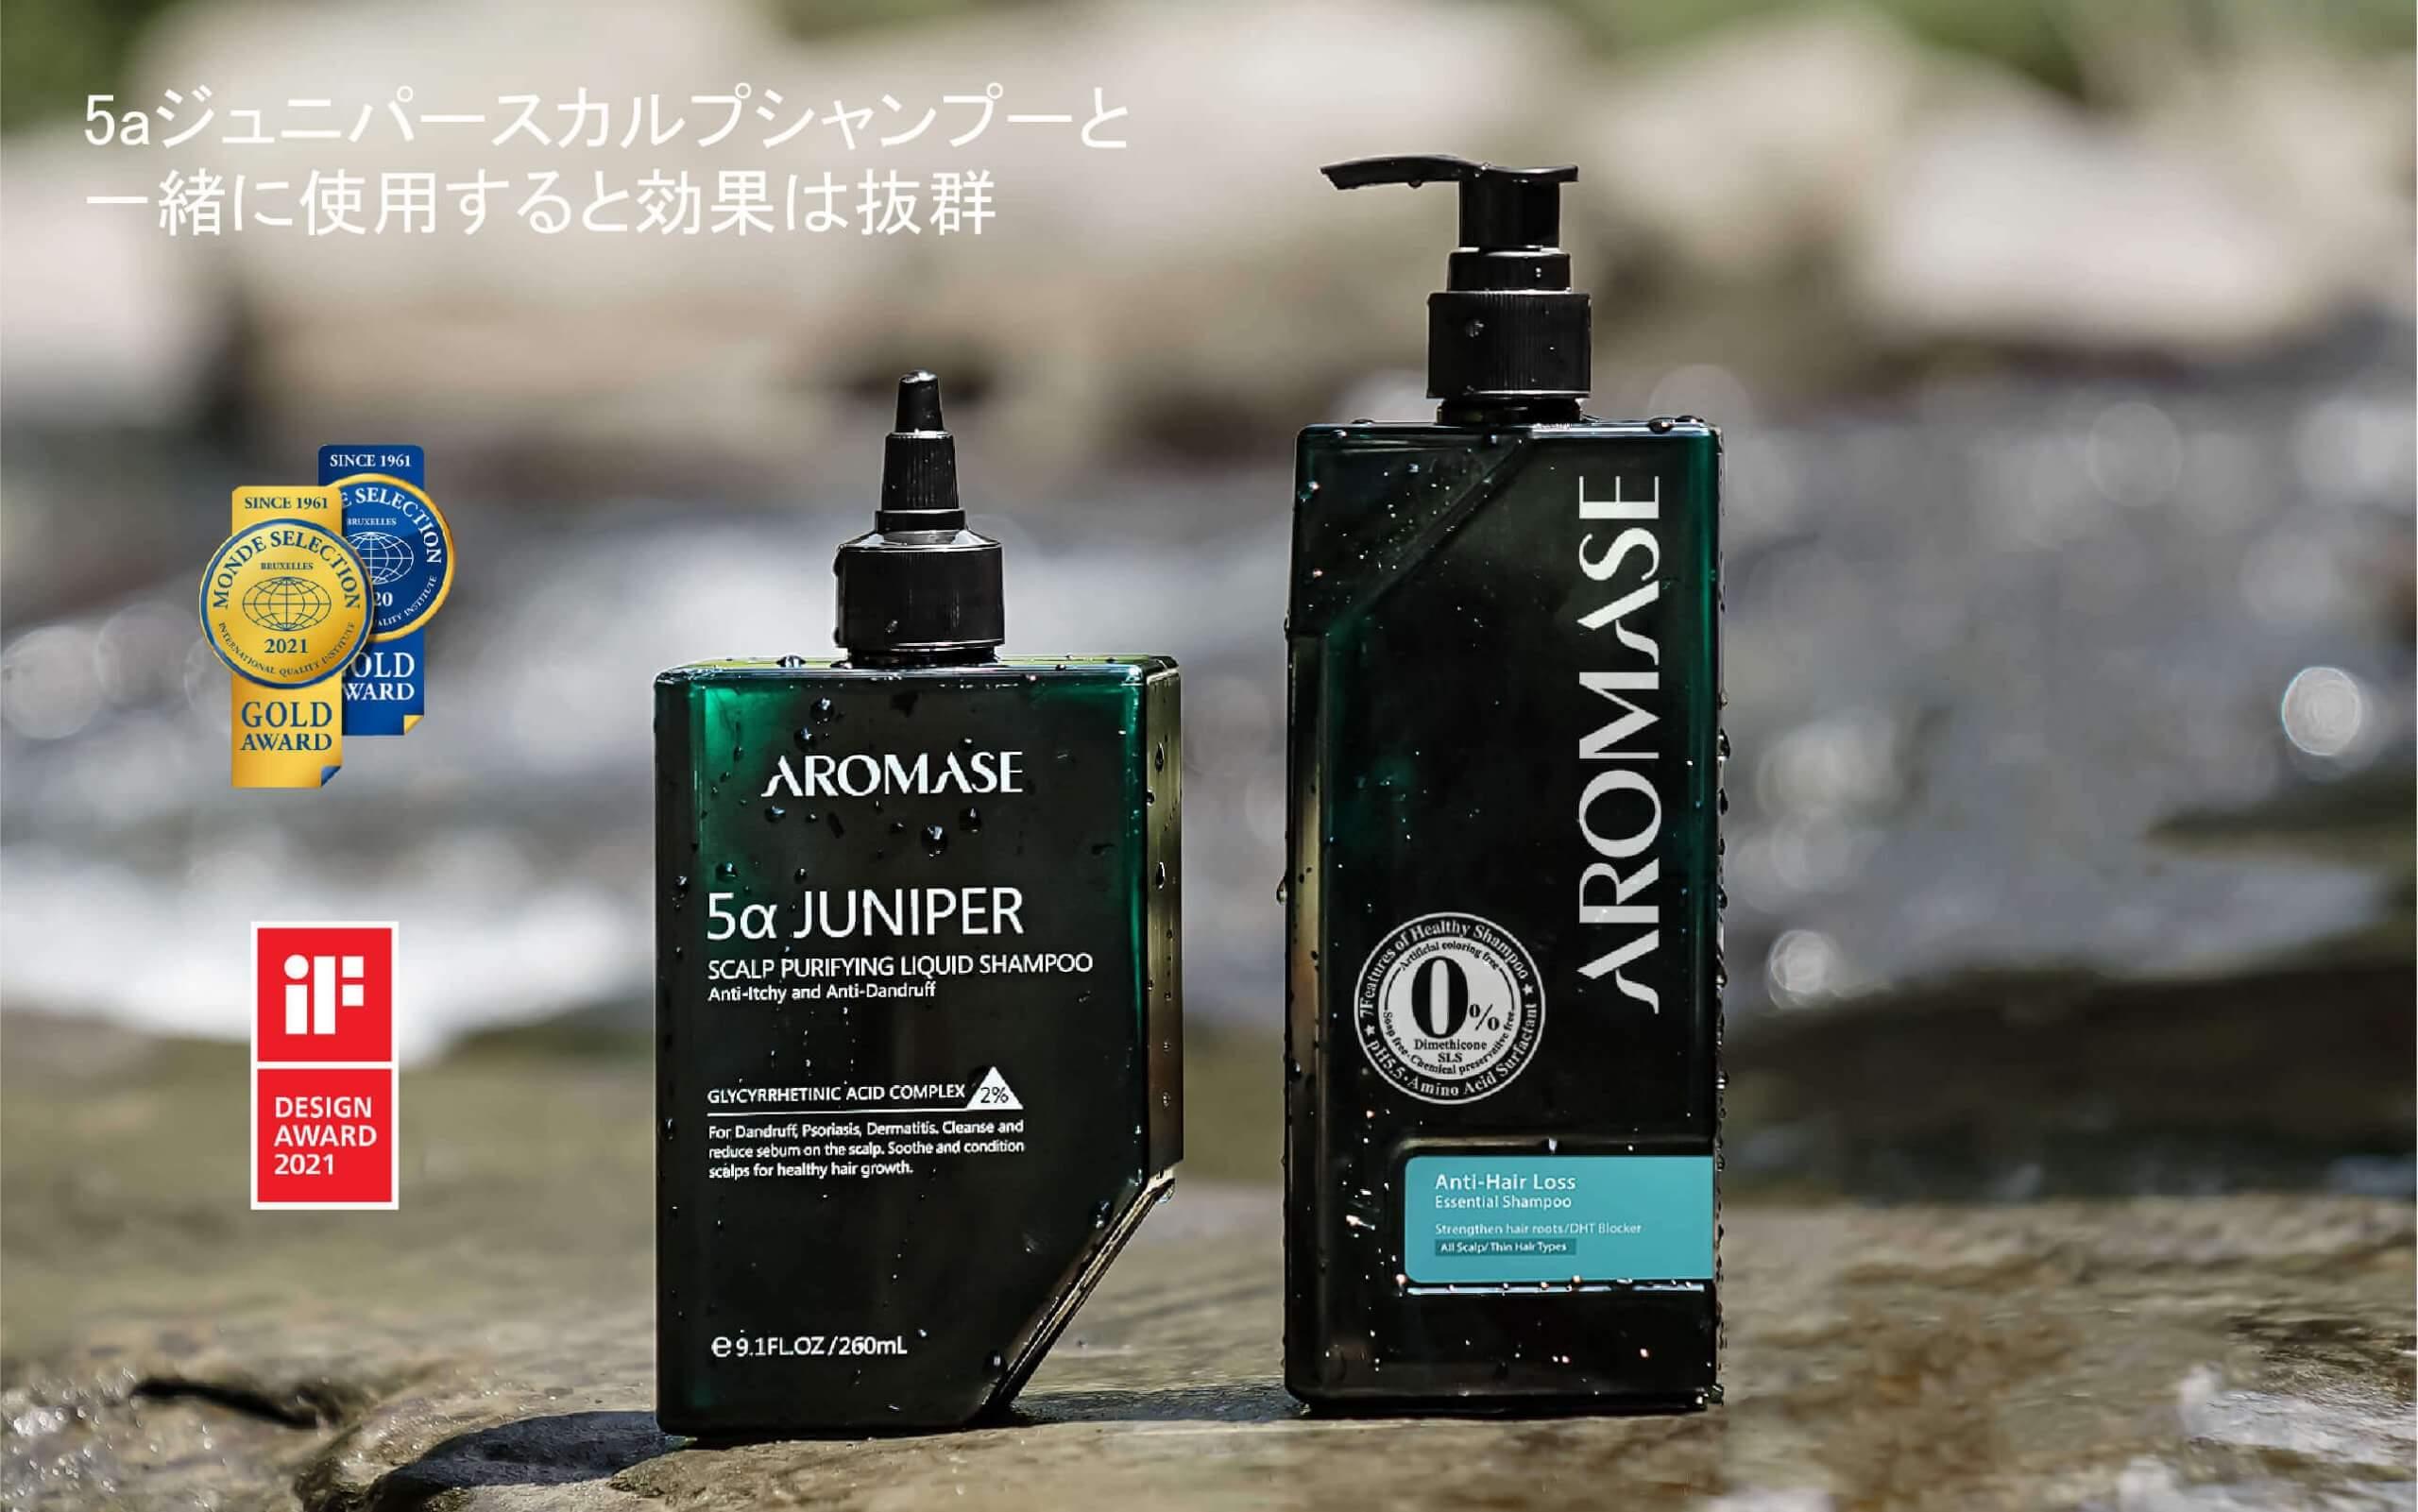 AROMASE japan Anti hair loss shampoo (2)